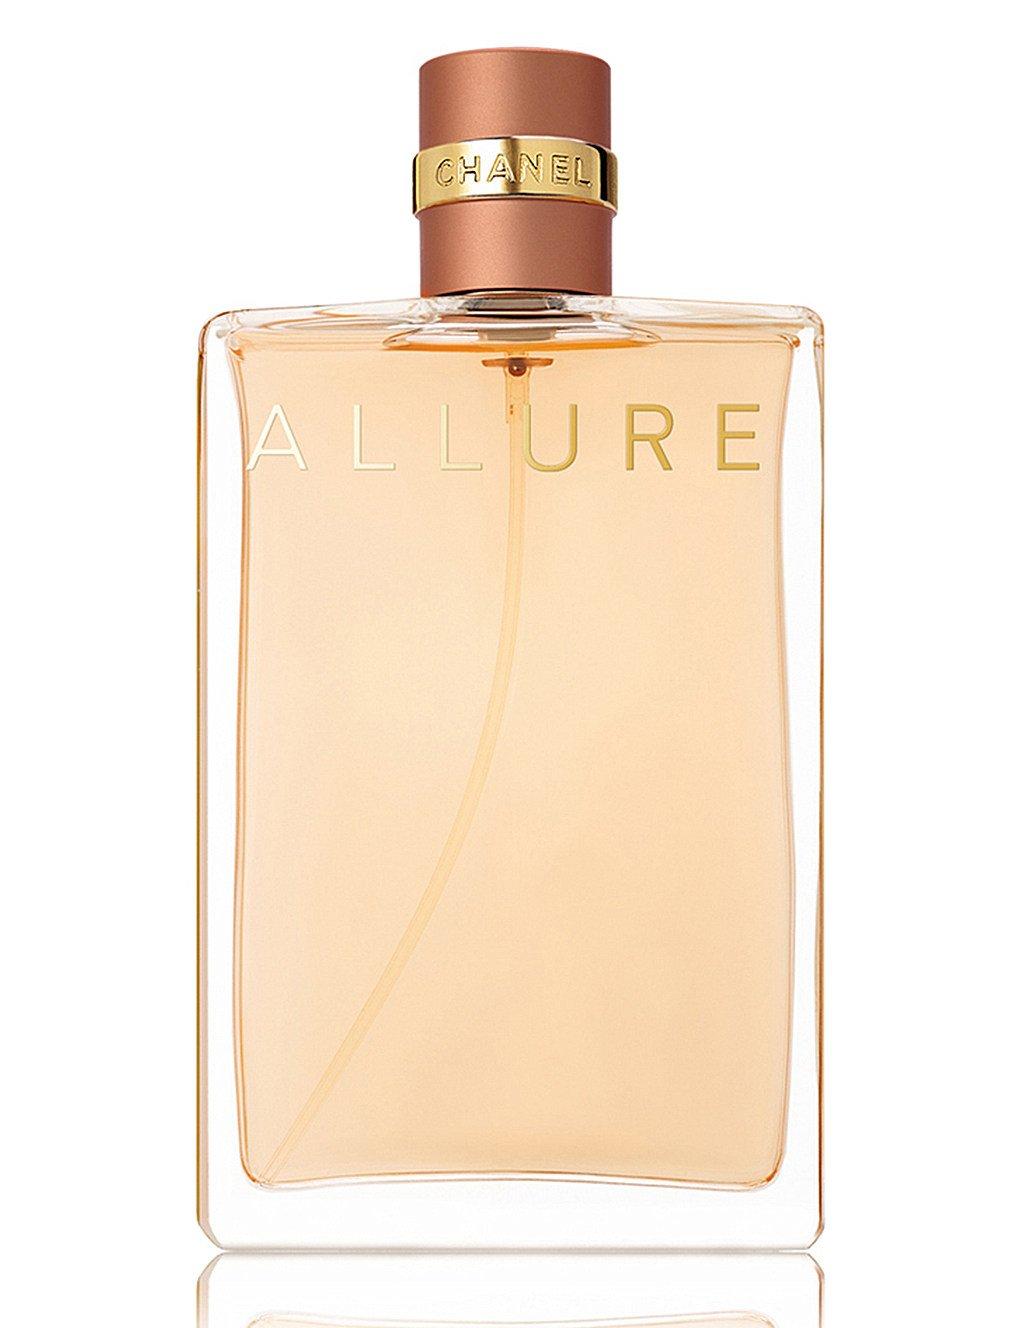 Chanel - Allure EDP 100 ml